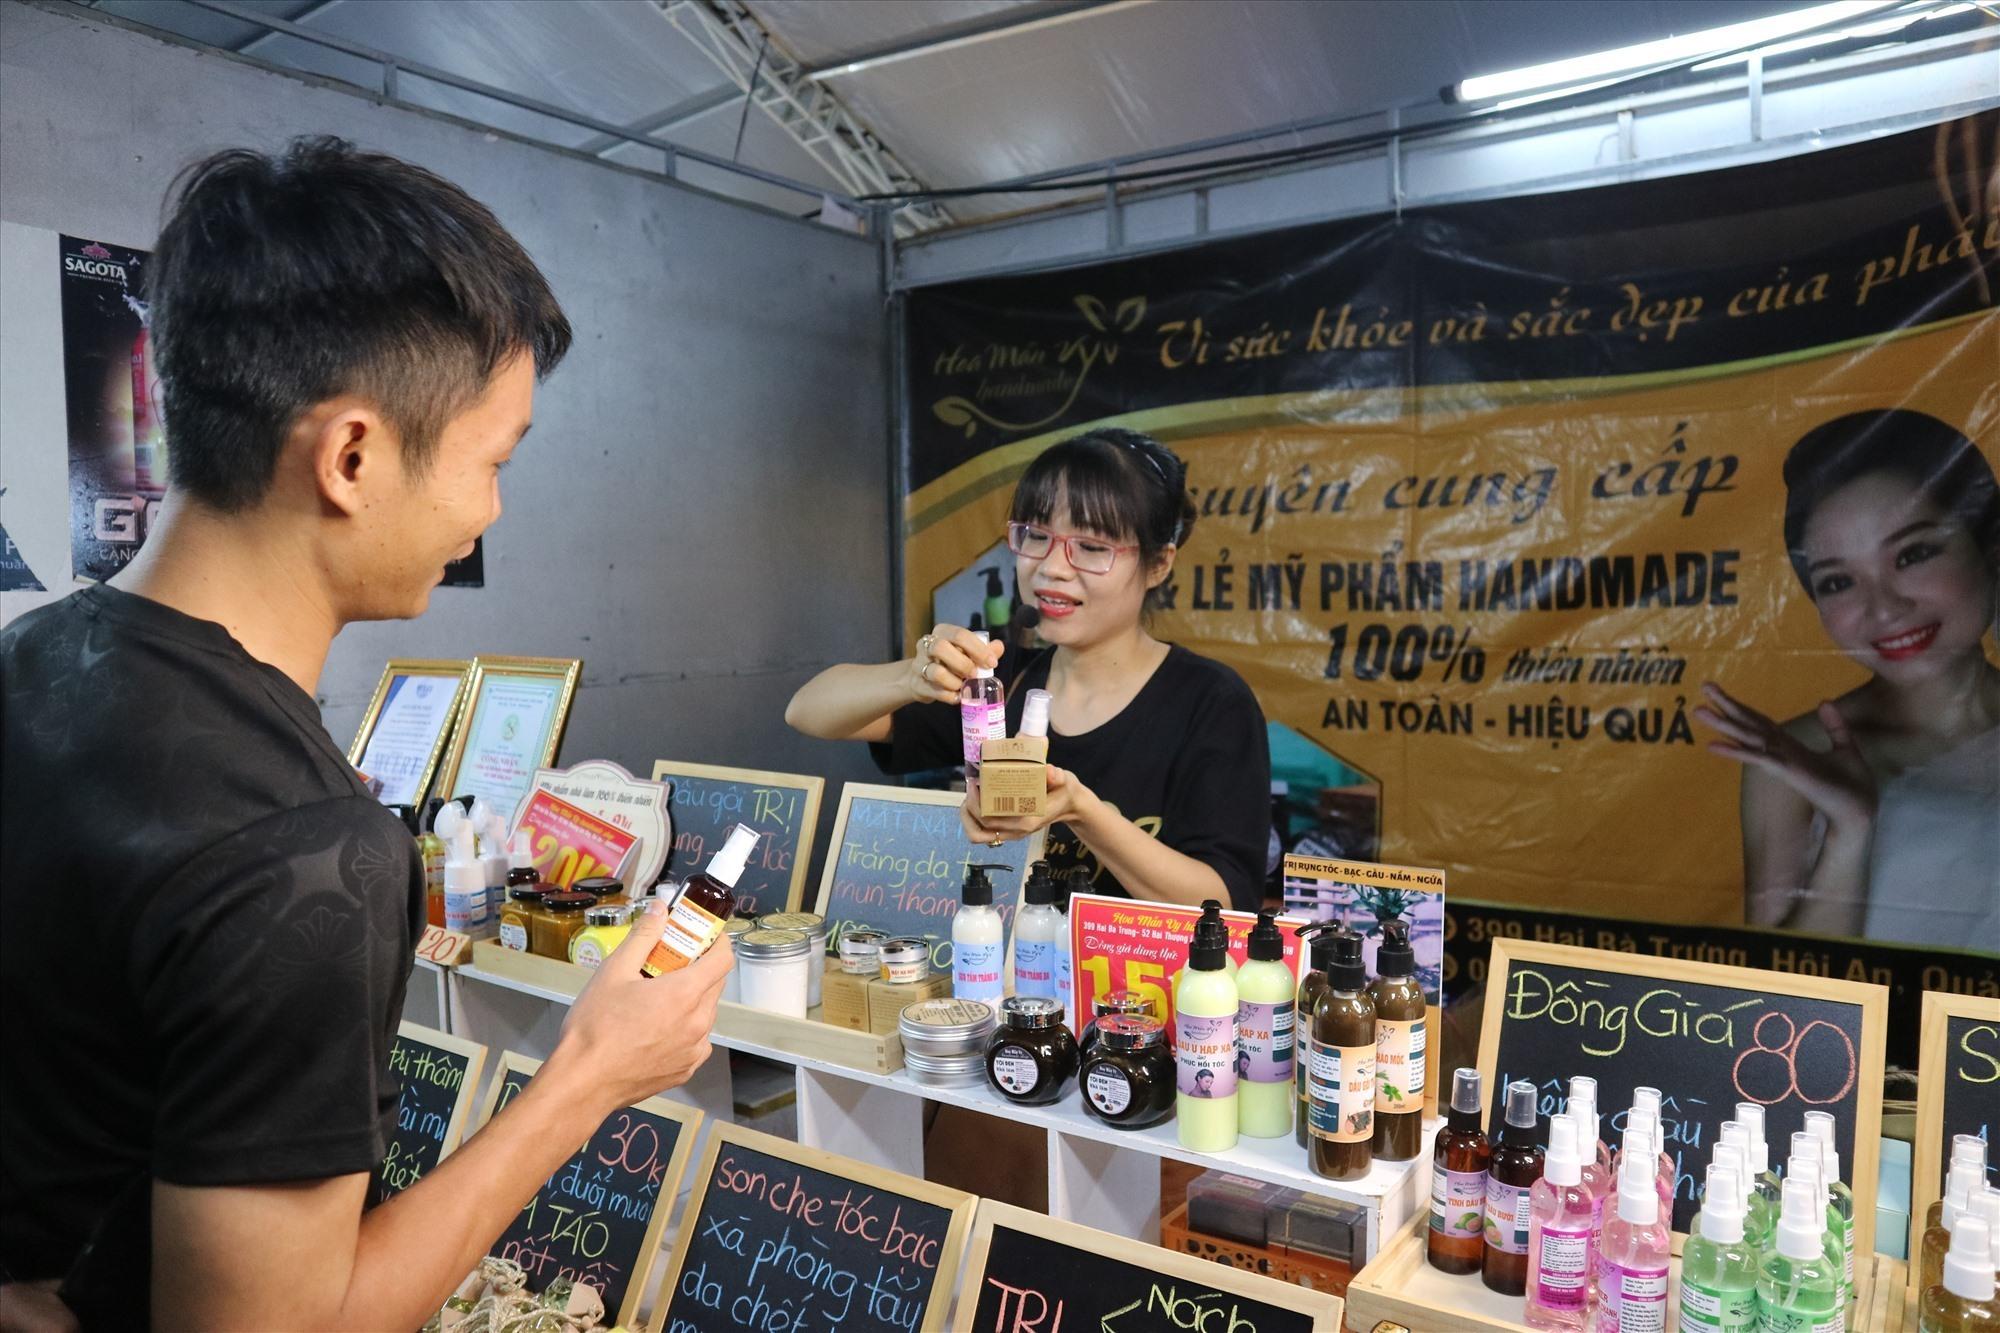 Hoa Man Vy natural cosmetics (form Hoi An)